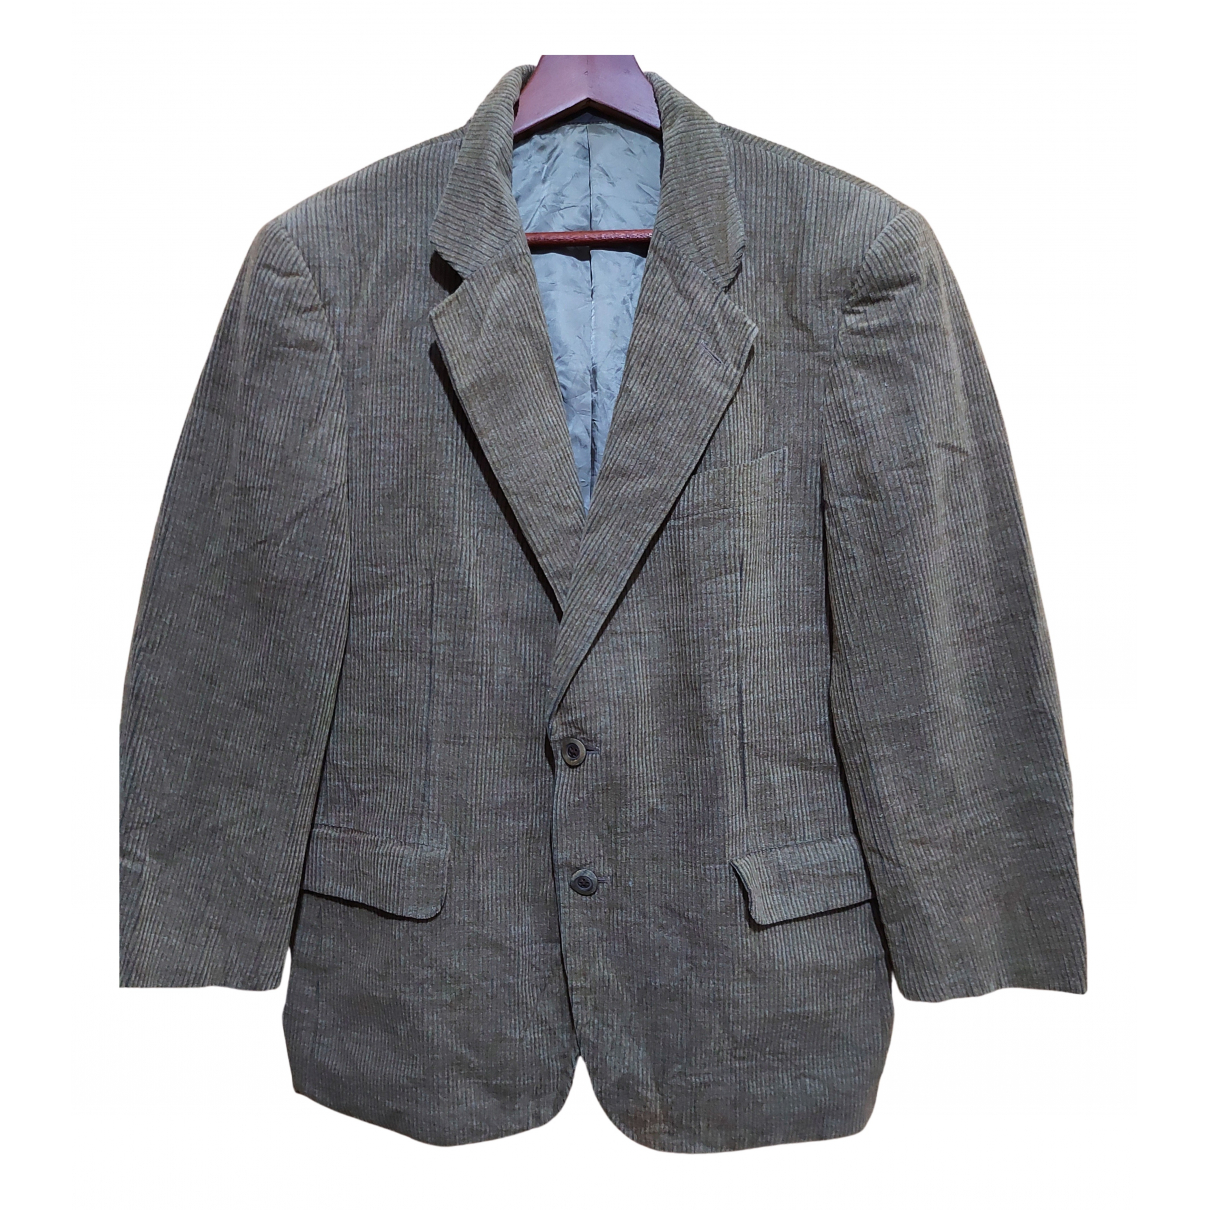 Burberry N Brown Wool Suits for Men L International